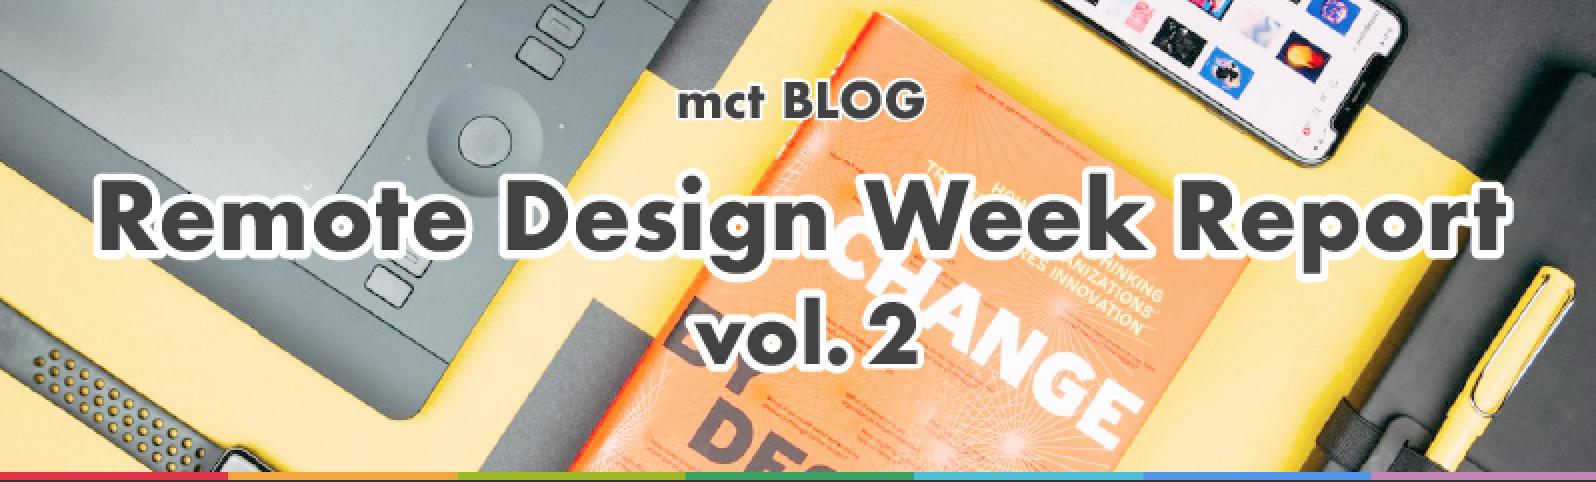 remote_design_week_vol2